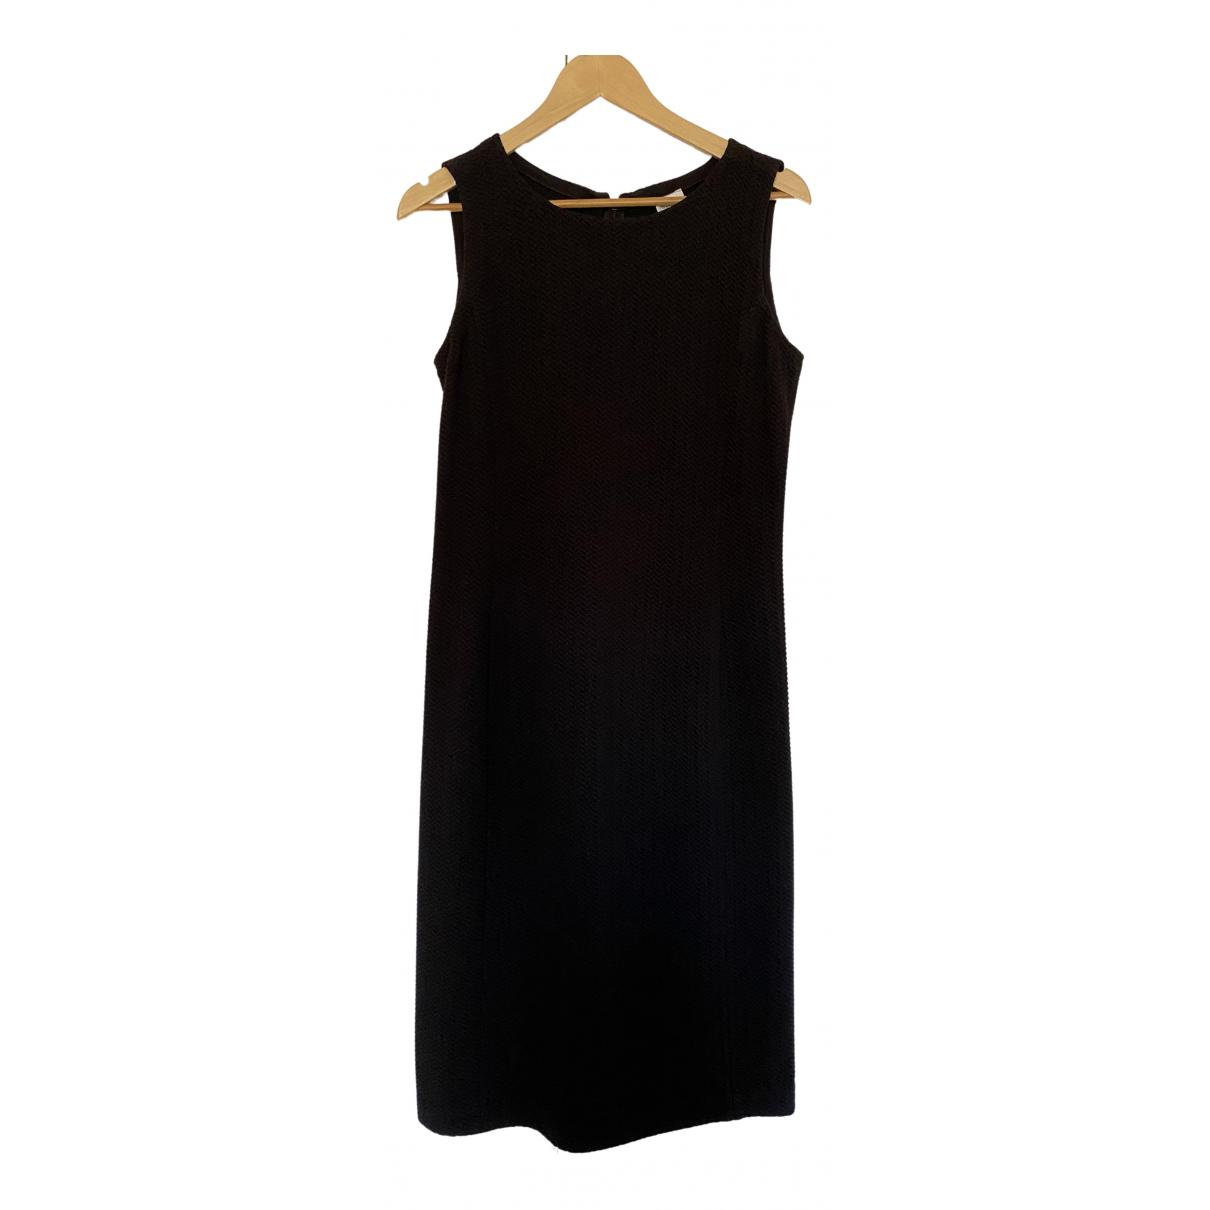 Armani Collezioni \N Kleid in  Schwarz Baumwolle - Elasthan